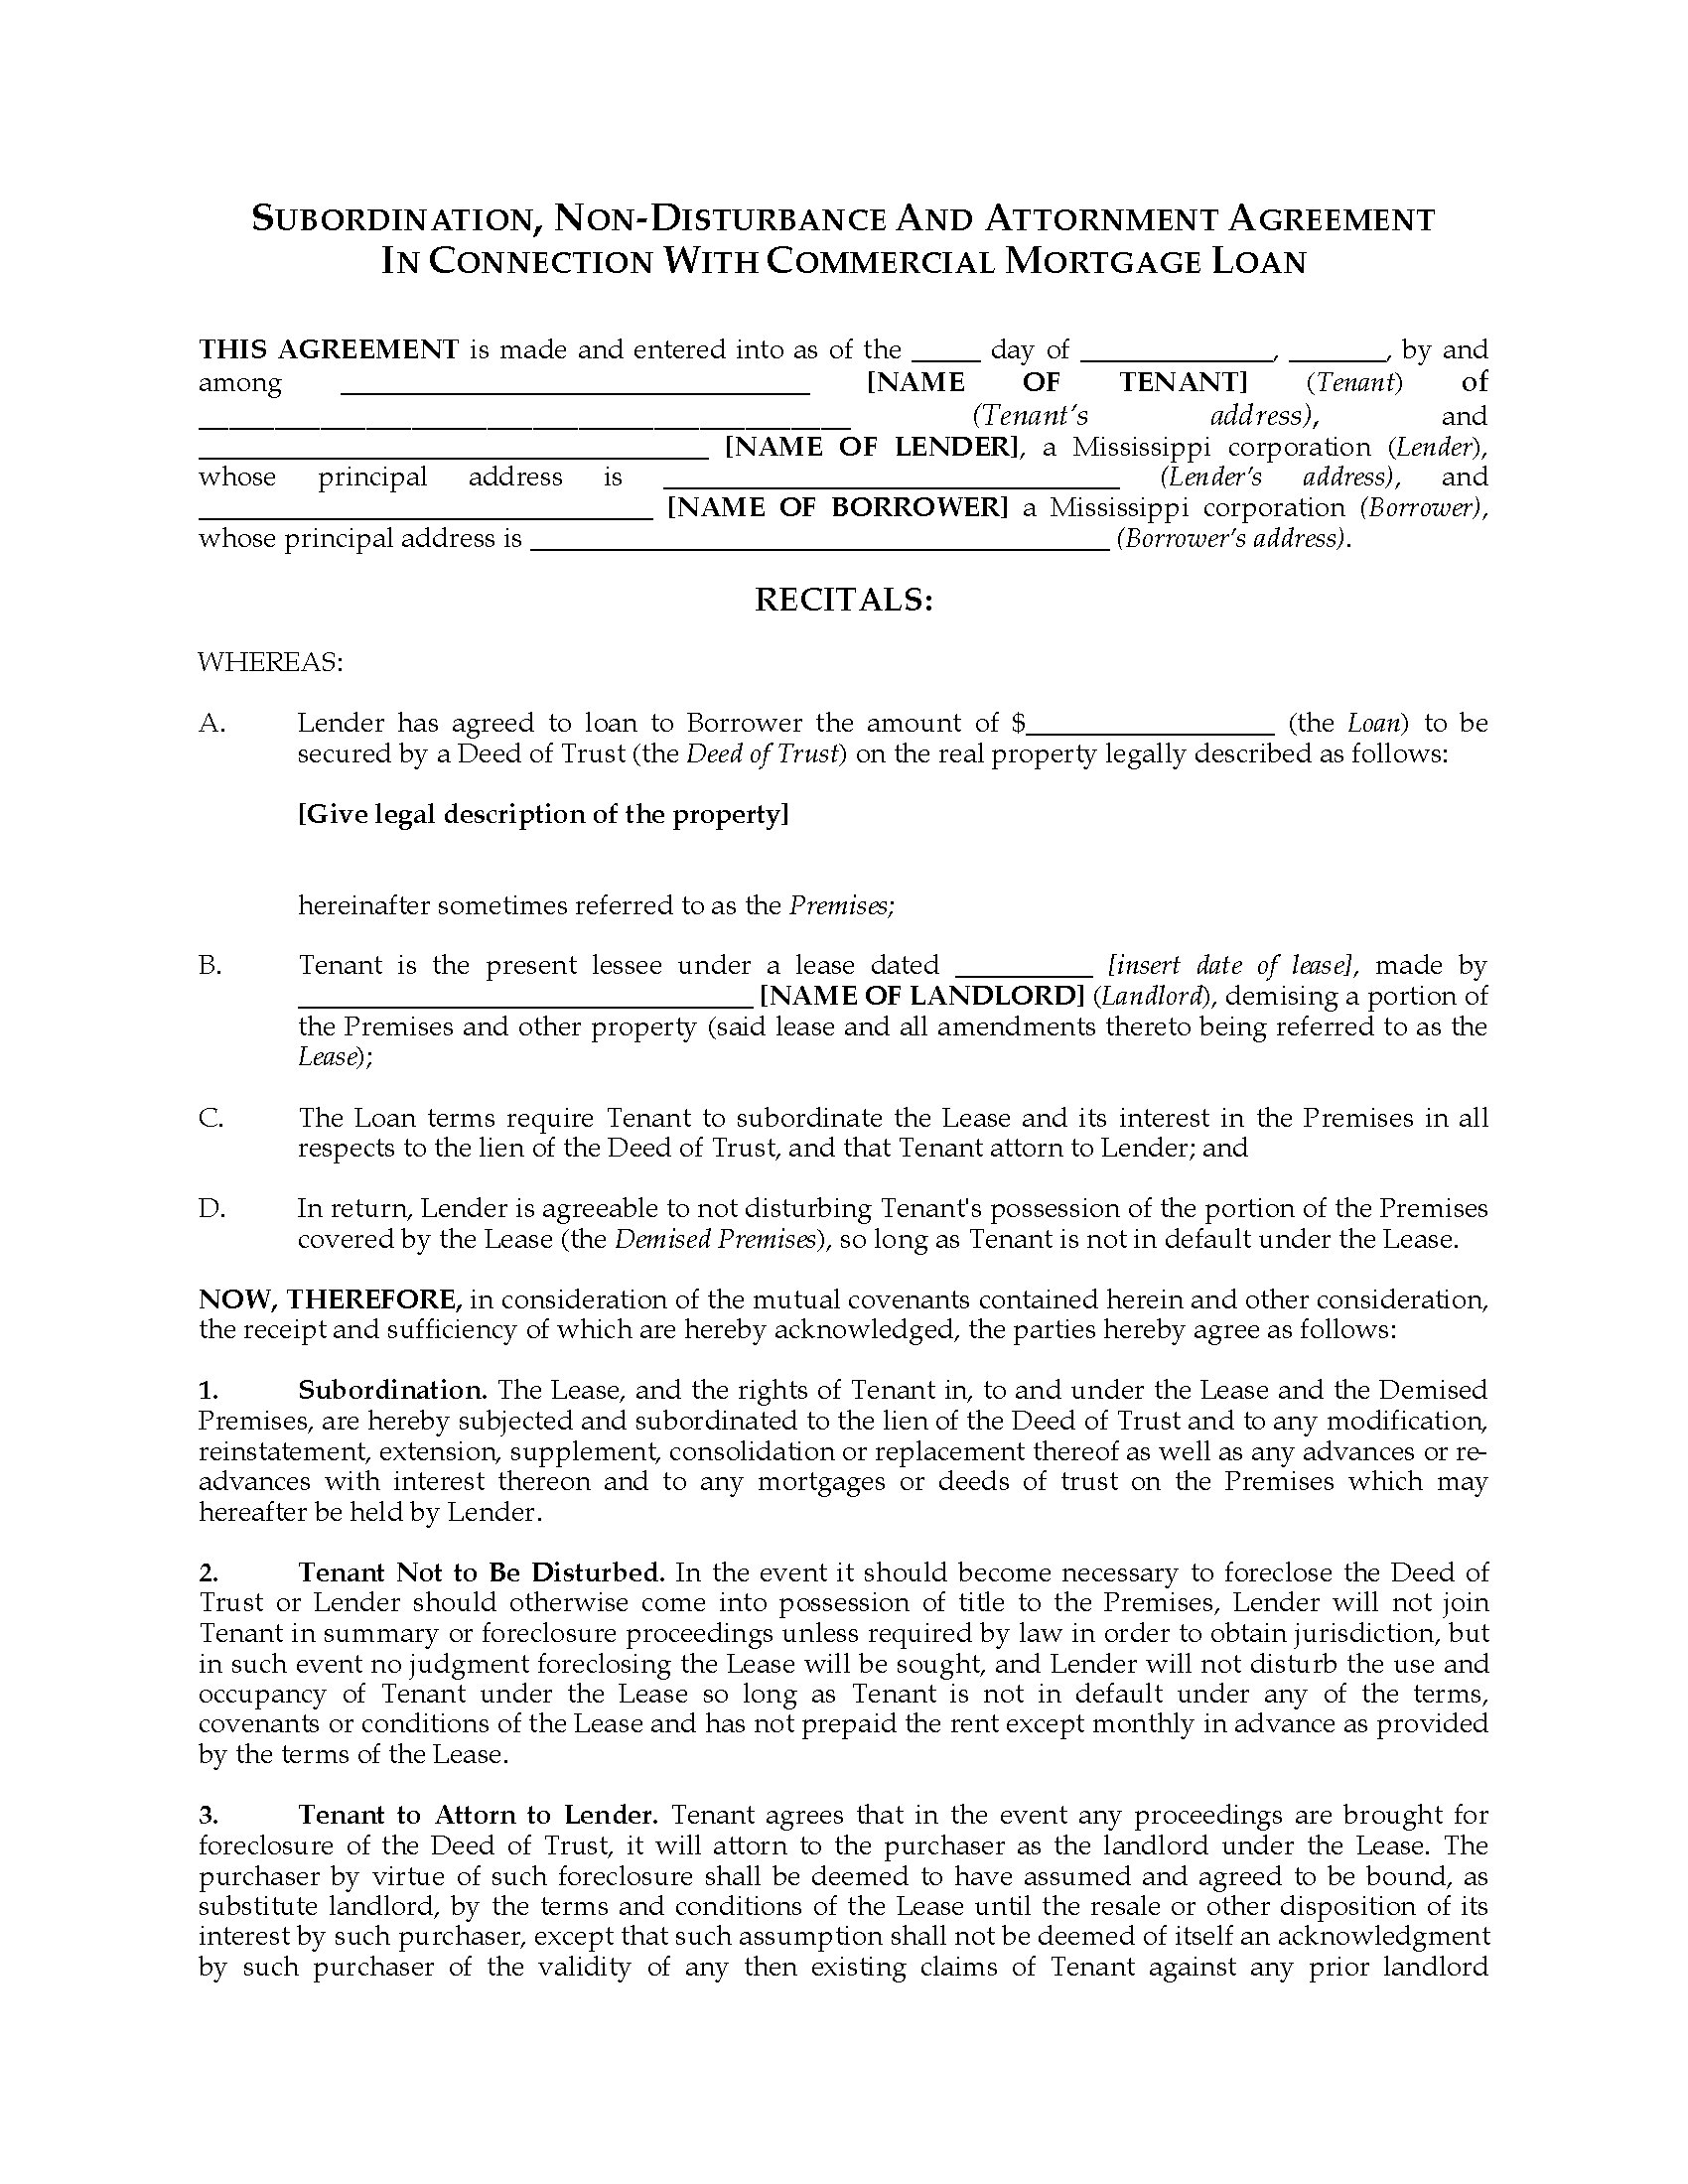 Picture Of Mississippi Subordination, Non Disturbance And Attornment  Agreement